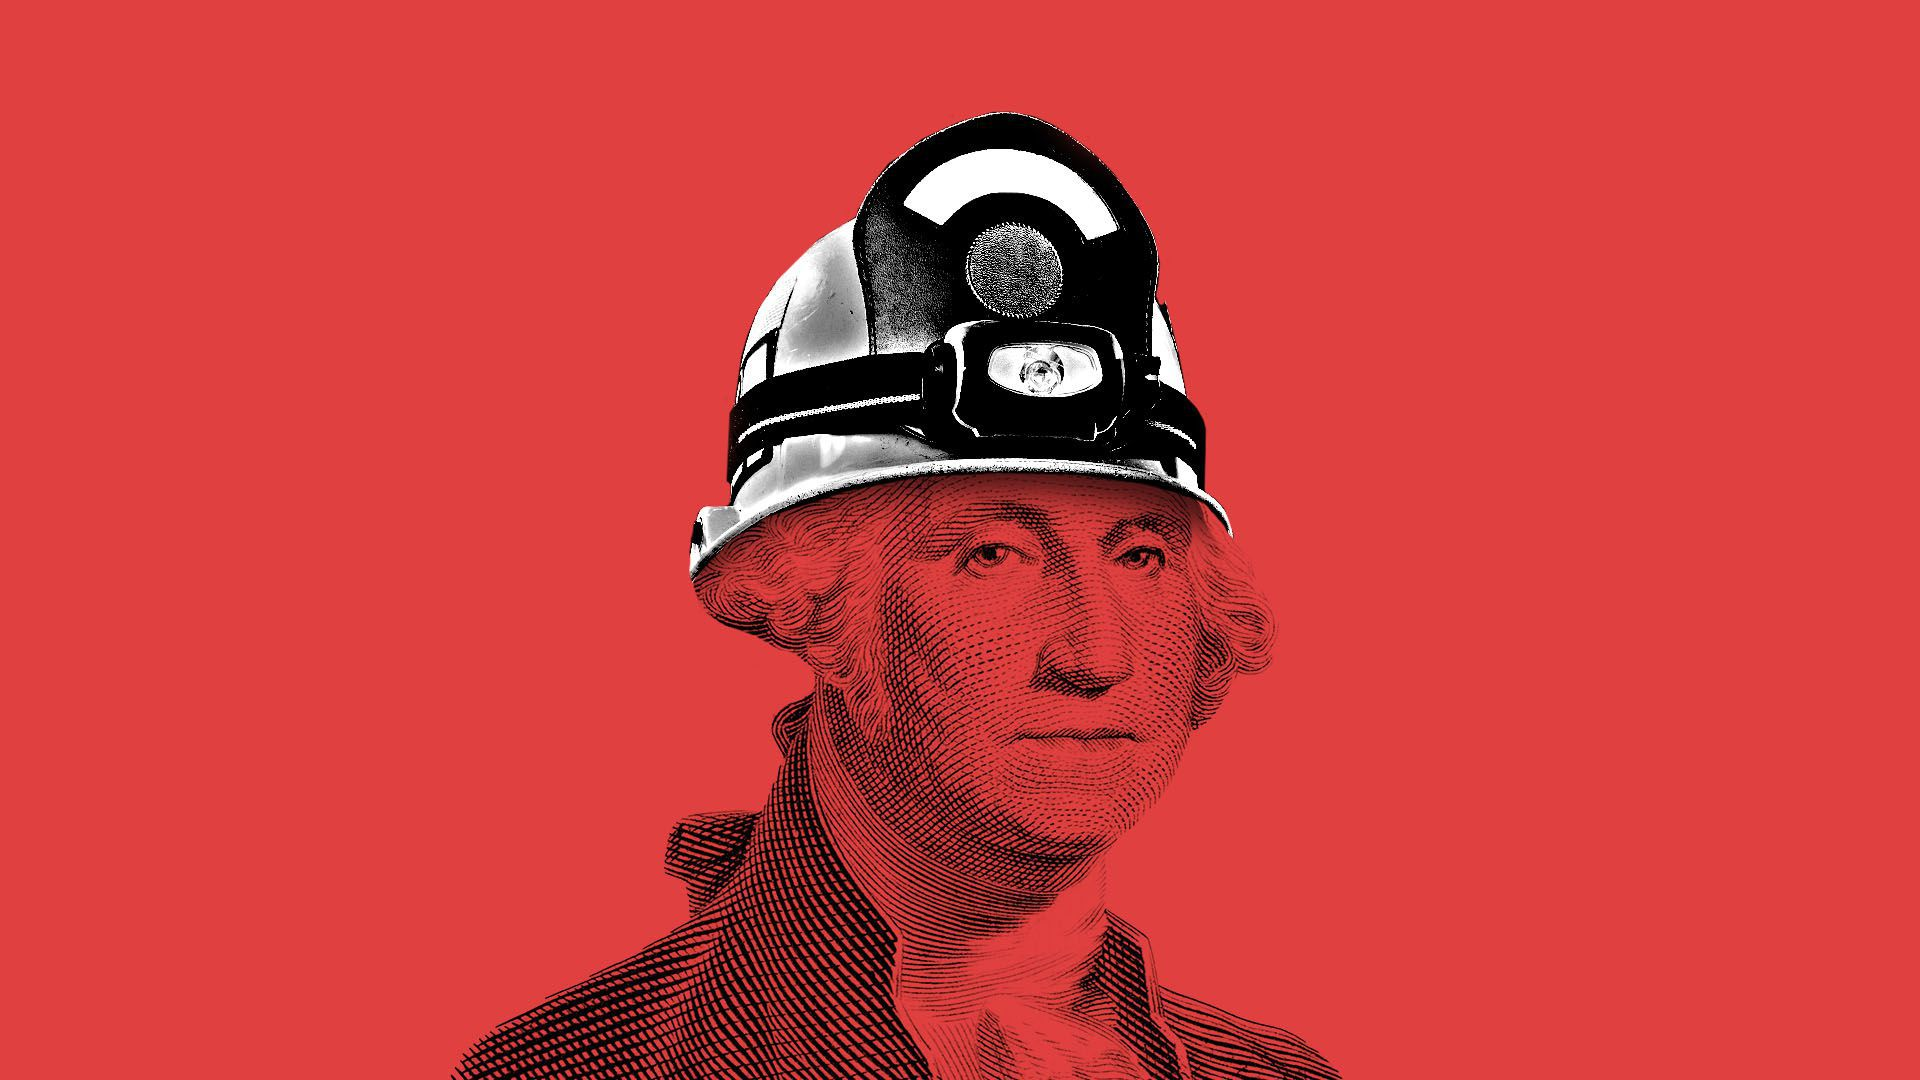 Illustration of George Washington wearing firefighter's helmet